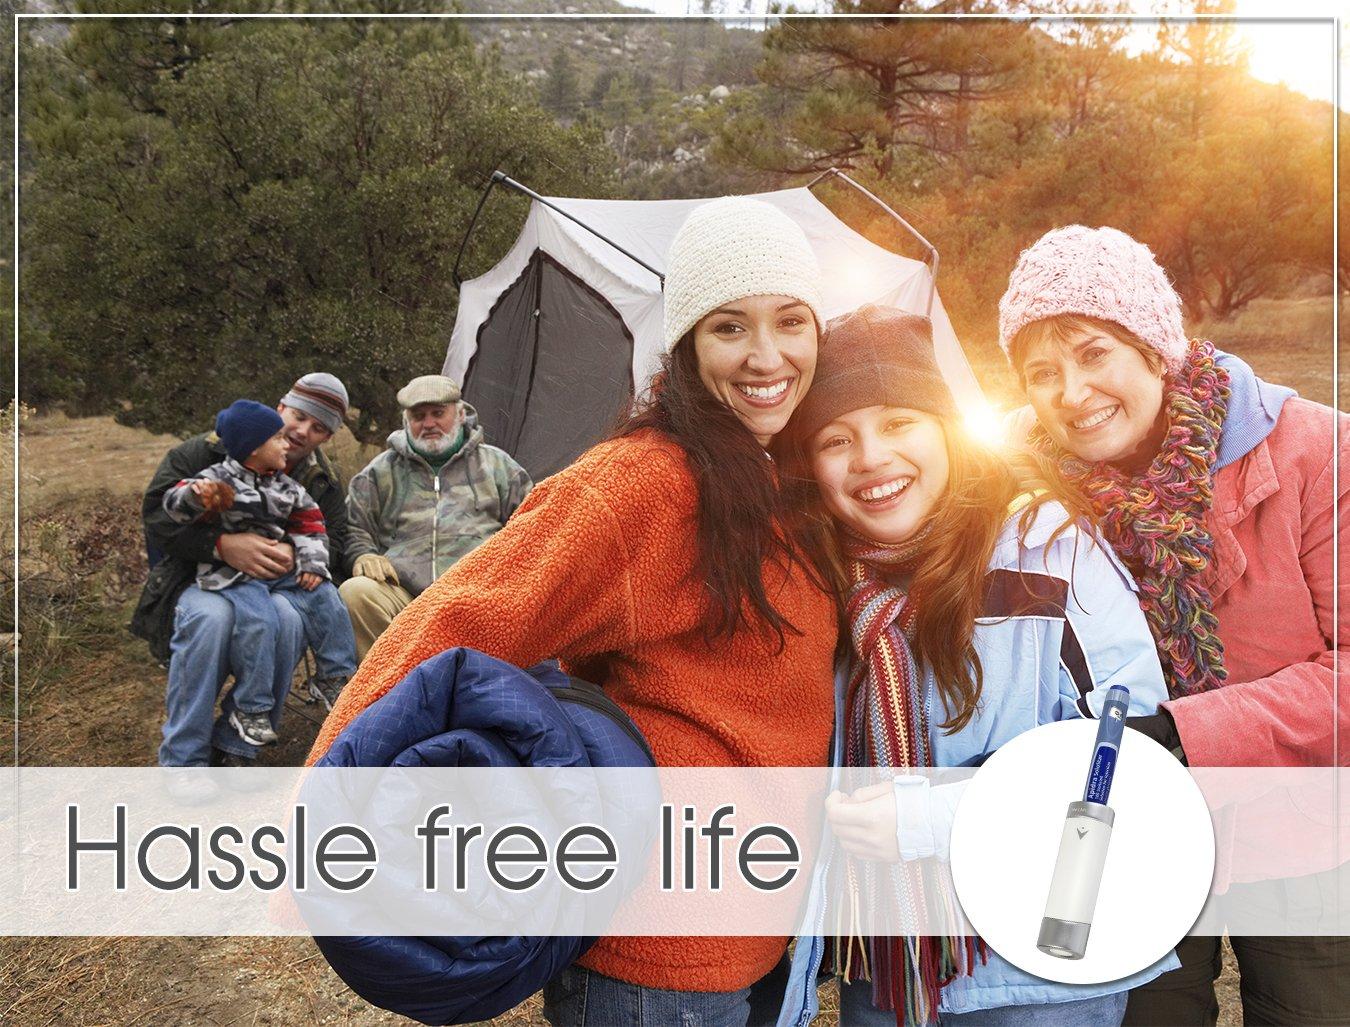 Small Reusable Insulin Cooler Pen-Cap by TempraMed | Vivi CAP1 for Sanofi SoloStar: Lantus, Apidra | Keeps Insulin Cool | for Daily use and Travel | FDA Registered by VIVI CAP (Image #7)